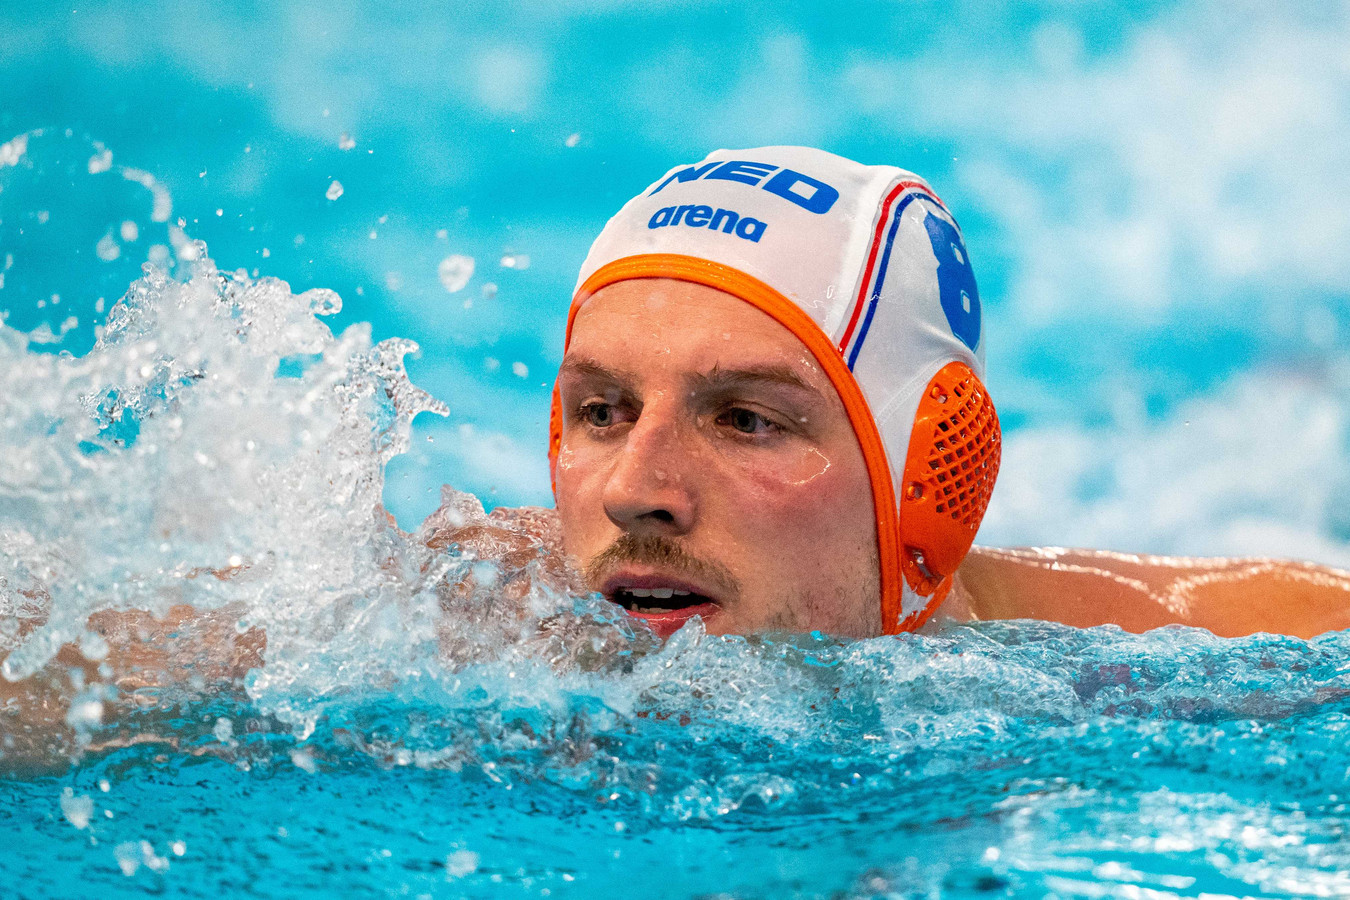 De Ambachtse waterpoloër Jesse Nispeling speelt volgend seizoen voor topclub AZC.